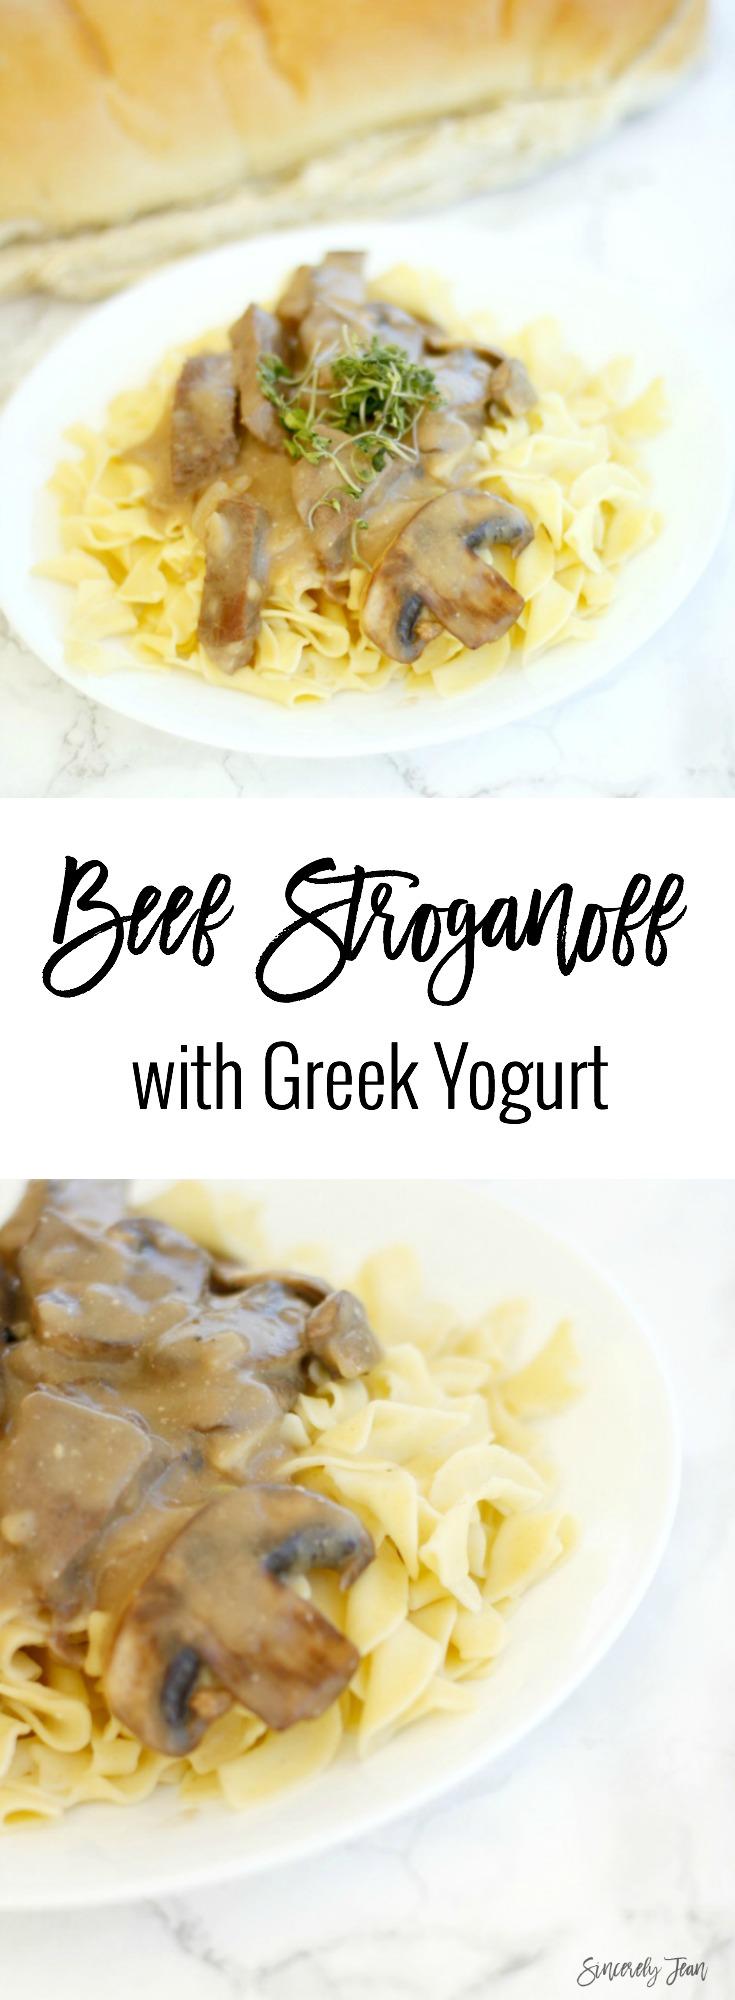 SincerelyJean.com beef stroganoff with greek yogurt